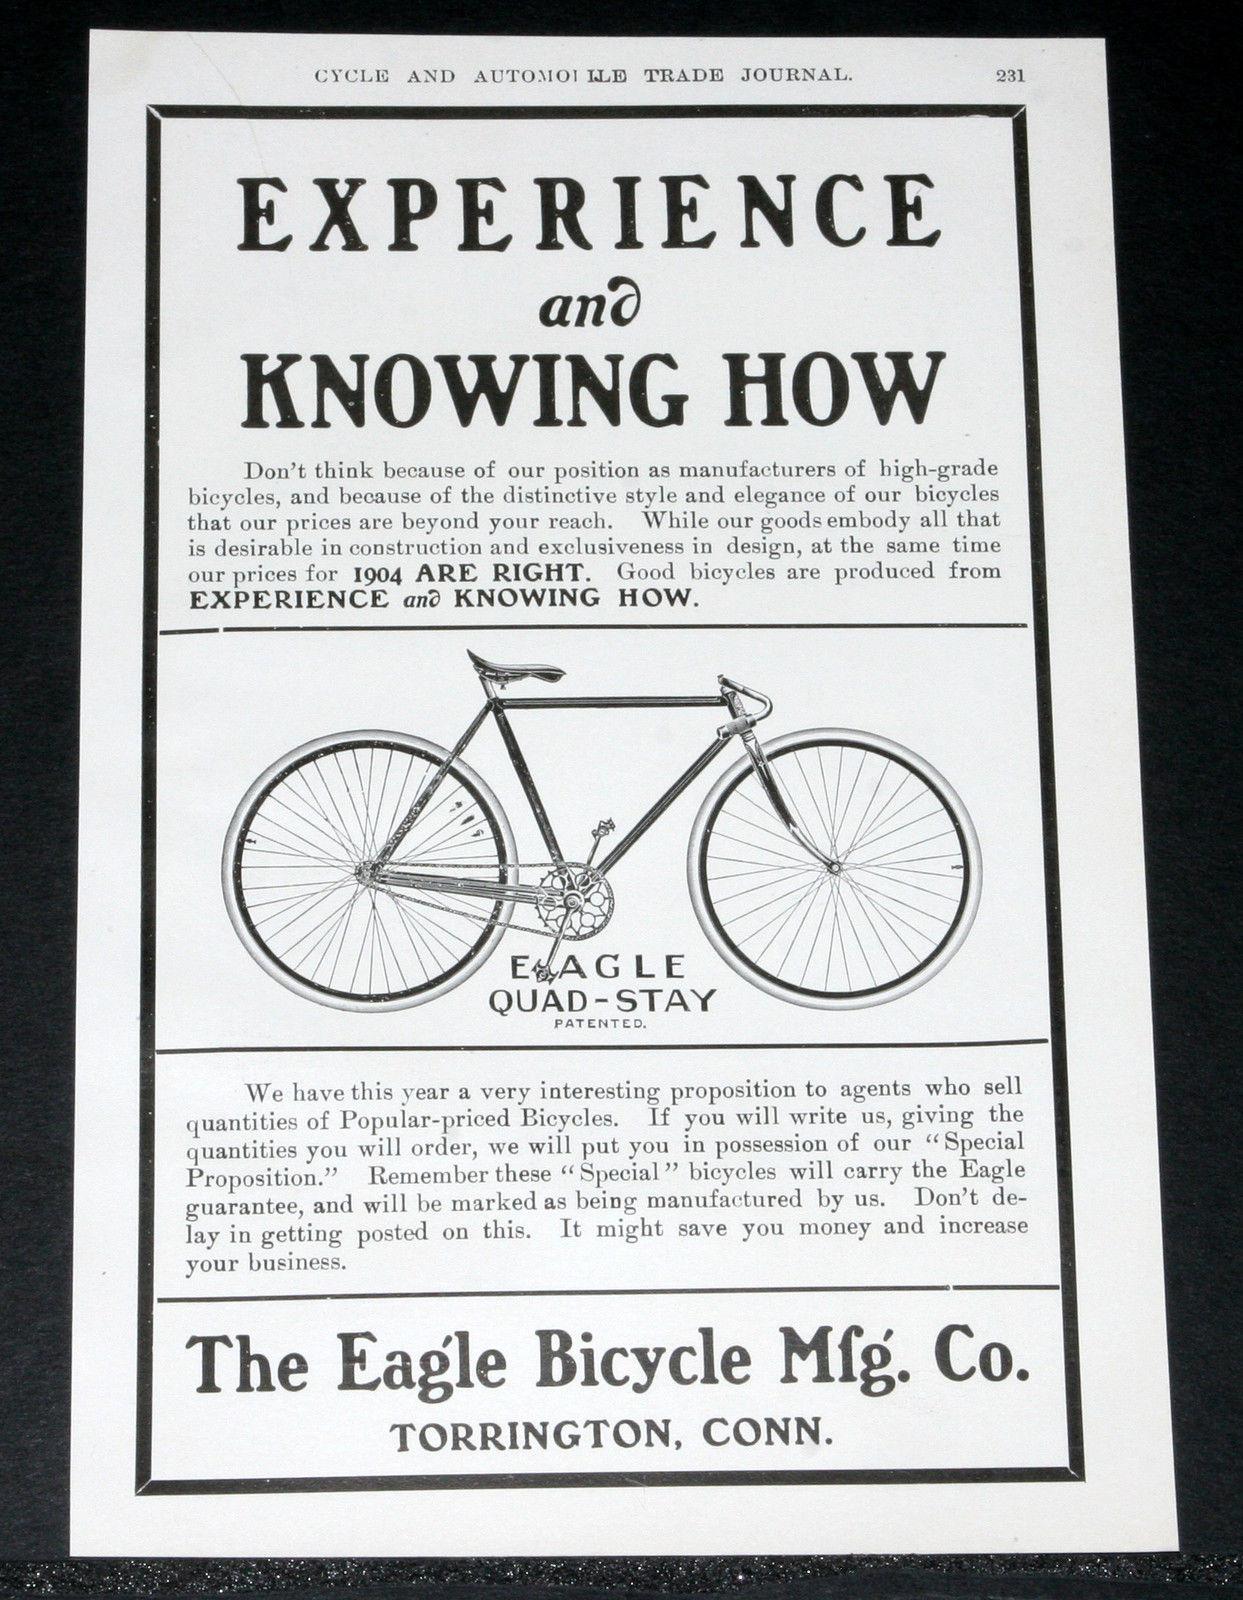 eagle-ad-1904-jpg.jpg